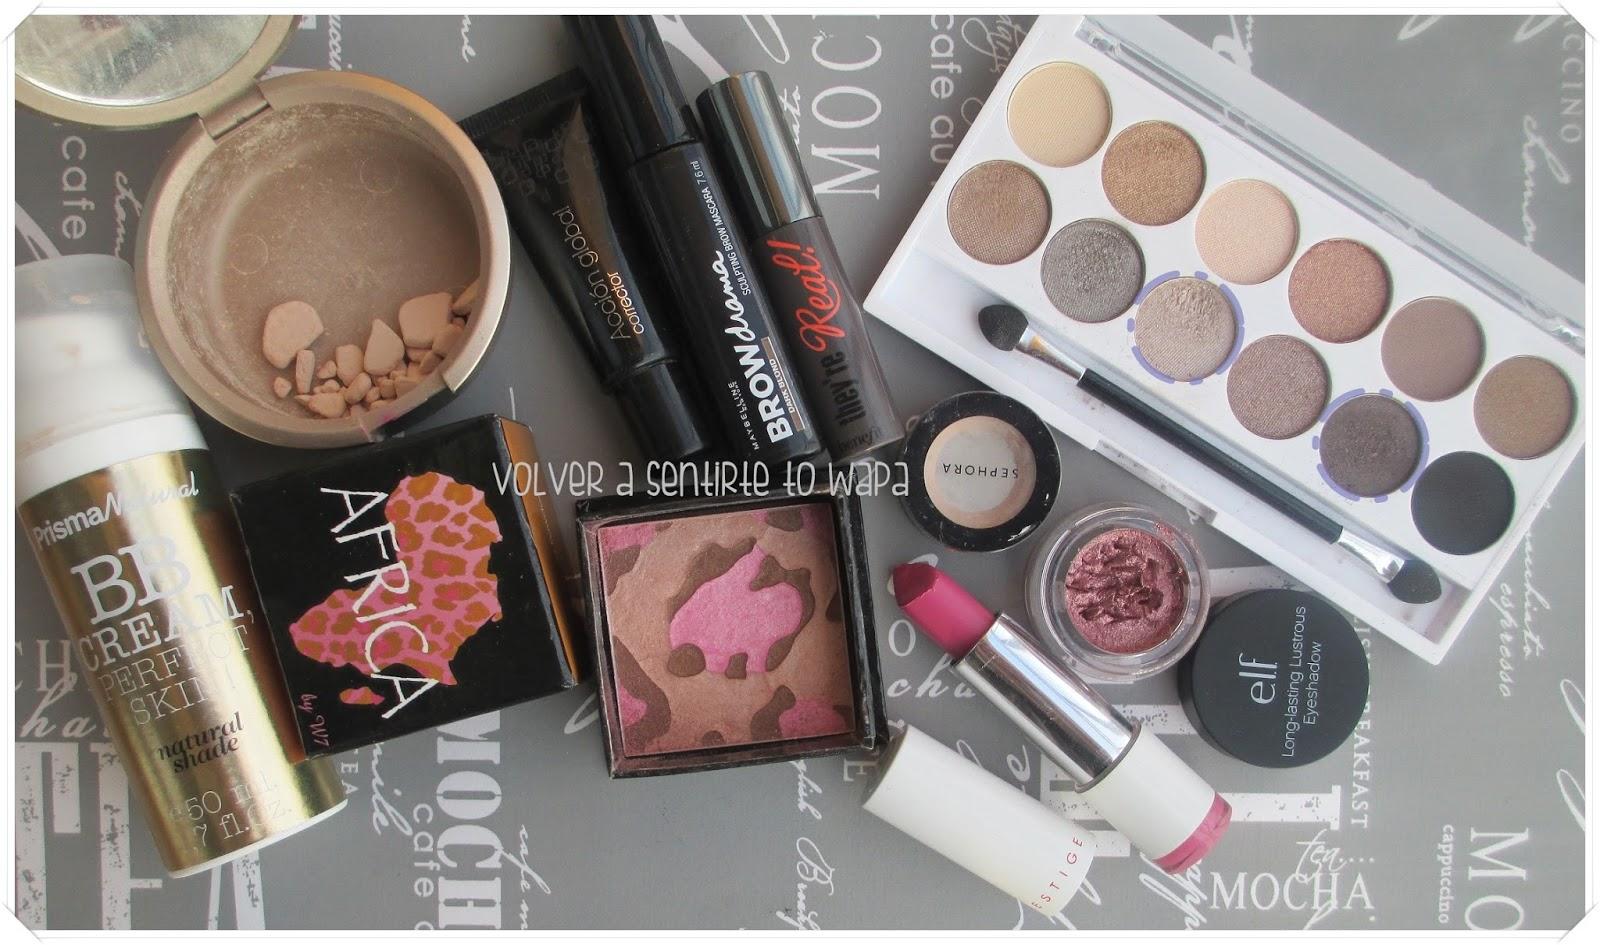 Maquillaje en rosa - Productos Utilizados - Volver a Sentirte to Wapa